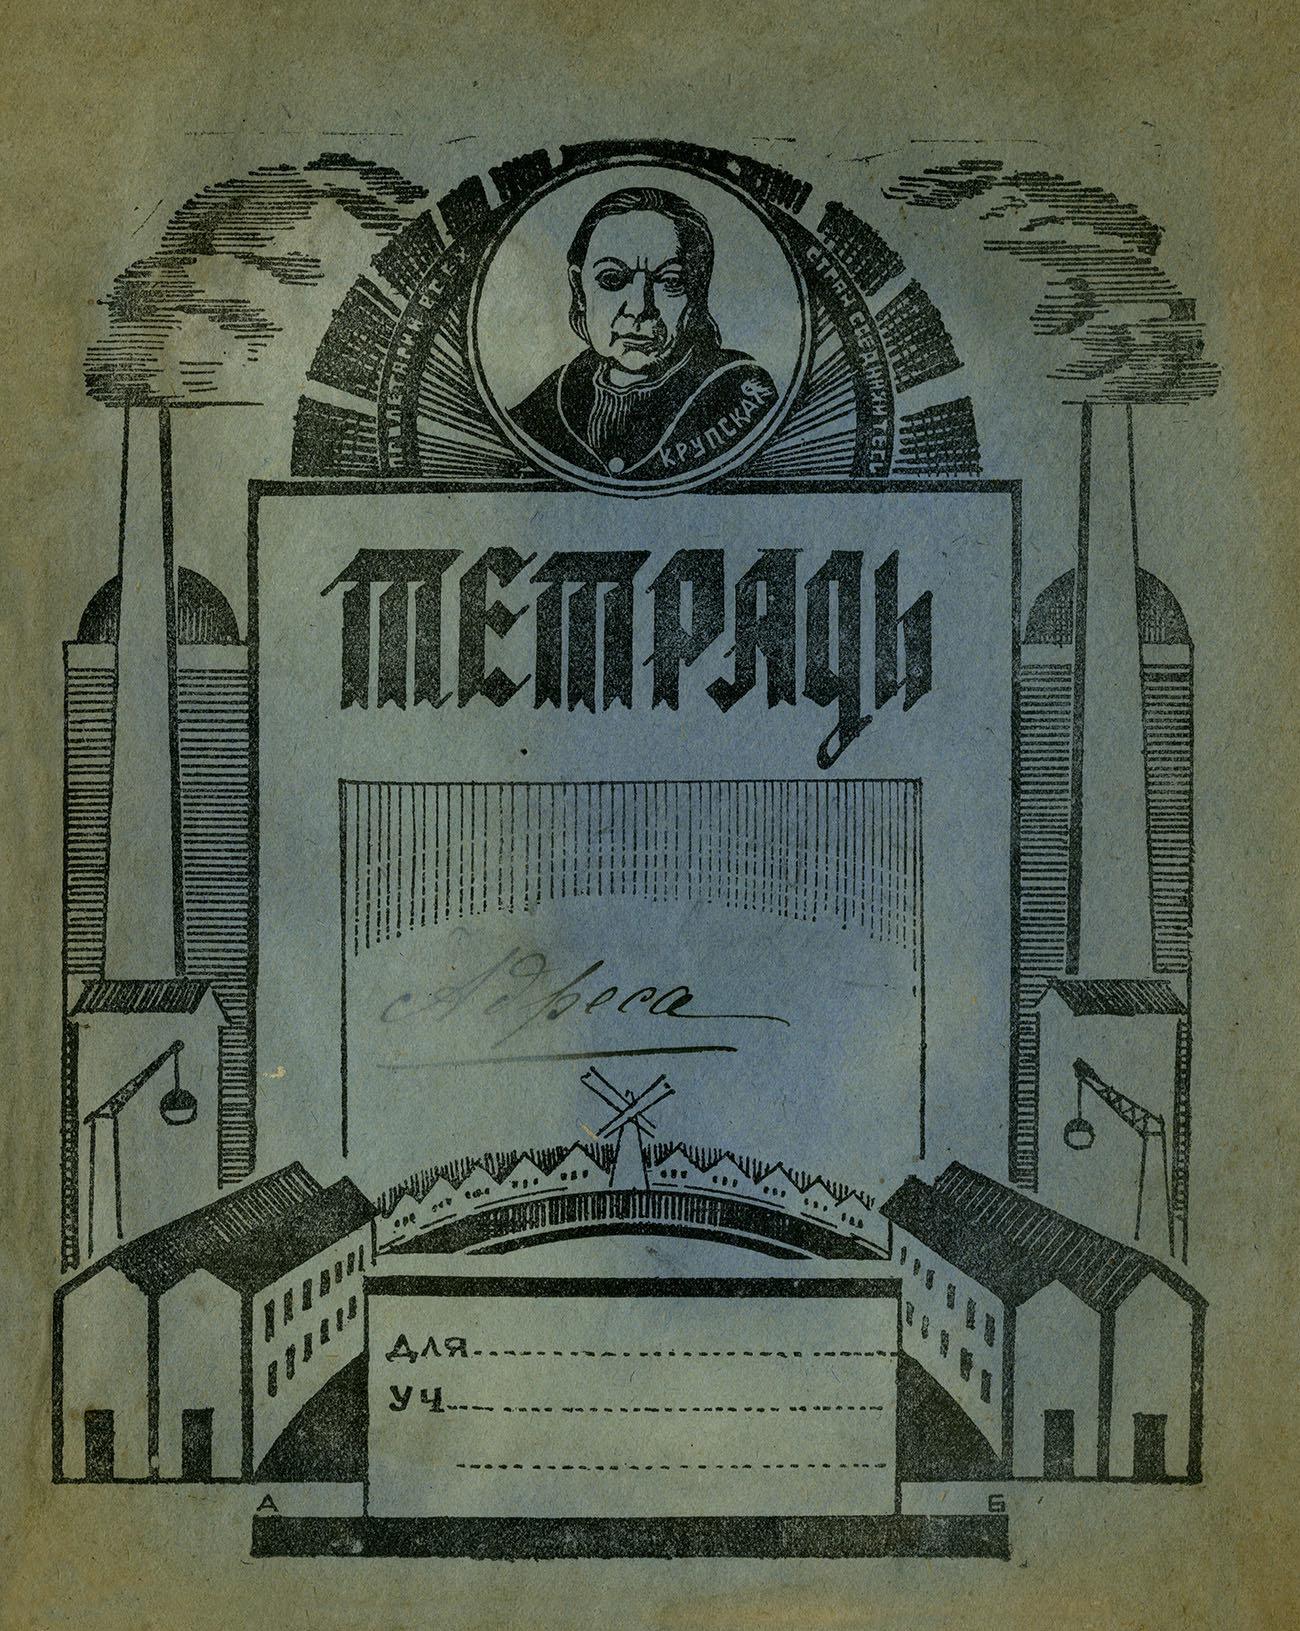 Тетрадь Крупская, вероятно 1929, Гомель, 175х220